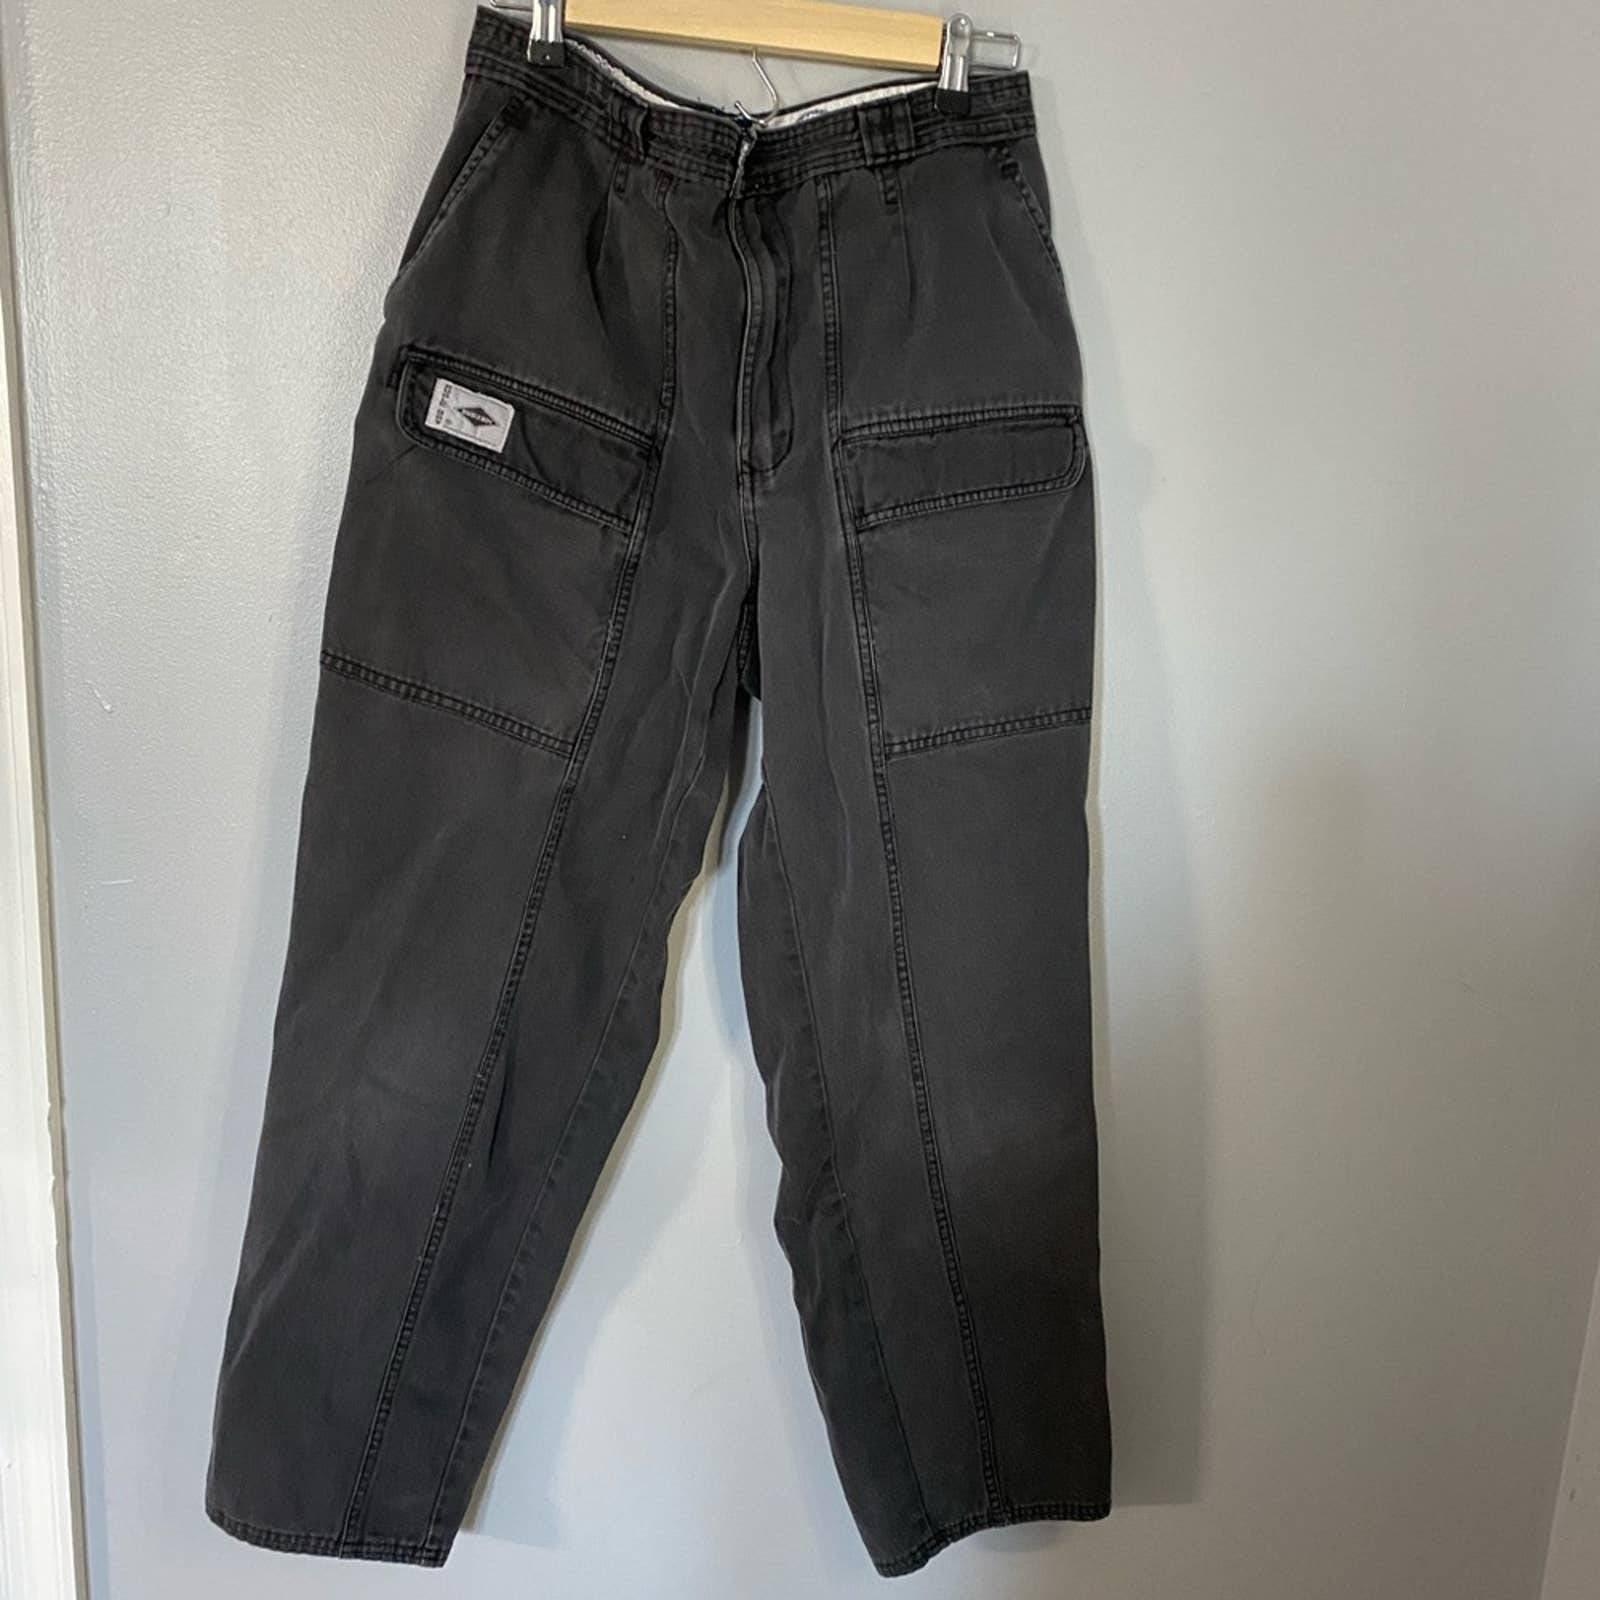 Bugle boy vintage tapered pants 34